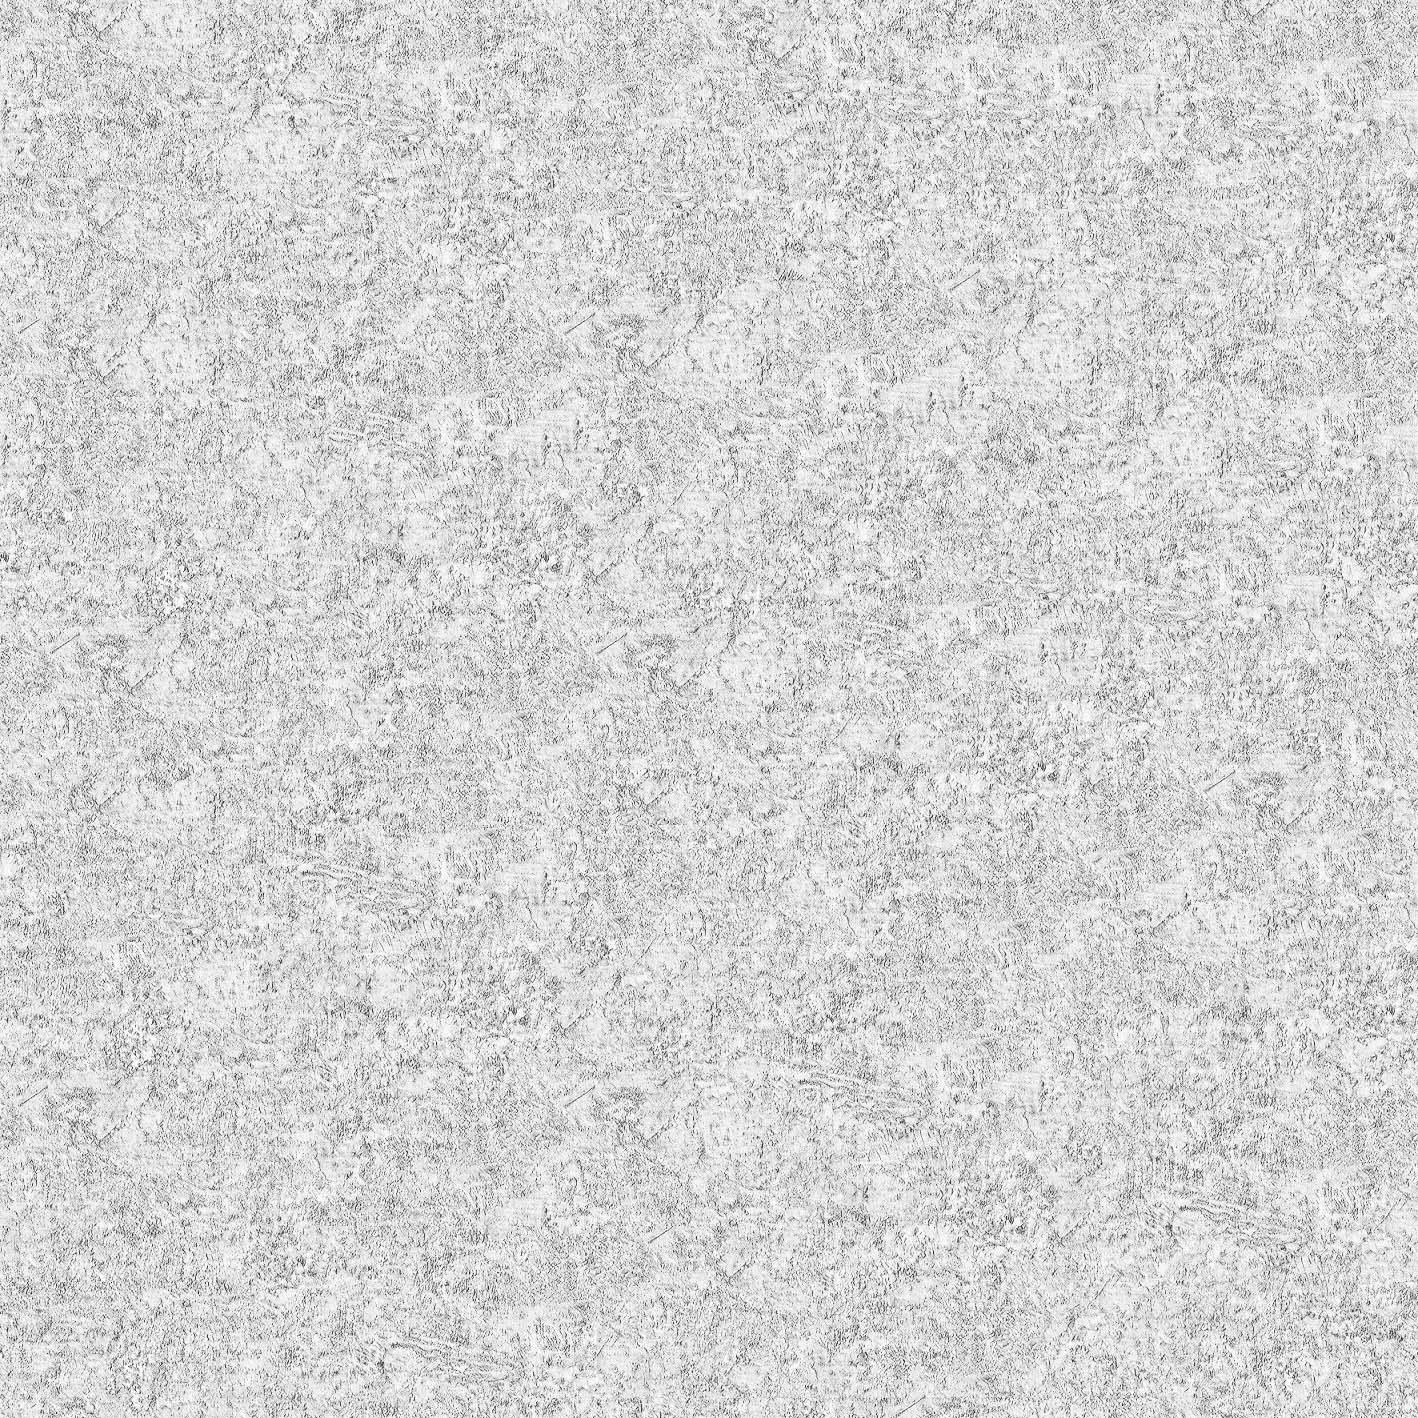 http://1.bp.blogspot.com/-TDSIIsFNc0c/UK4p4t9uaII/AAAAAAAAB-s/HwuukuQBAJI/s1600/Texture%2Bseamless%2Bwallpaper%2B2%2Bbump%2Bmap.jpg